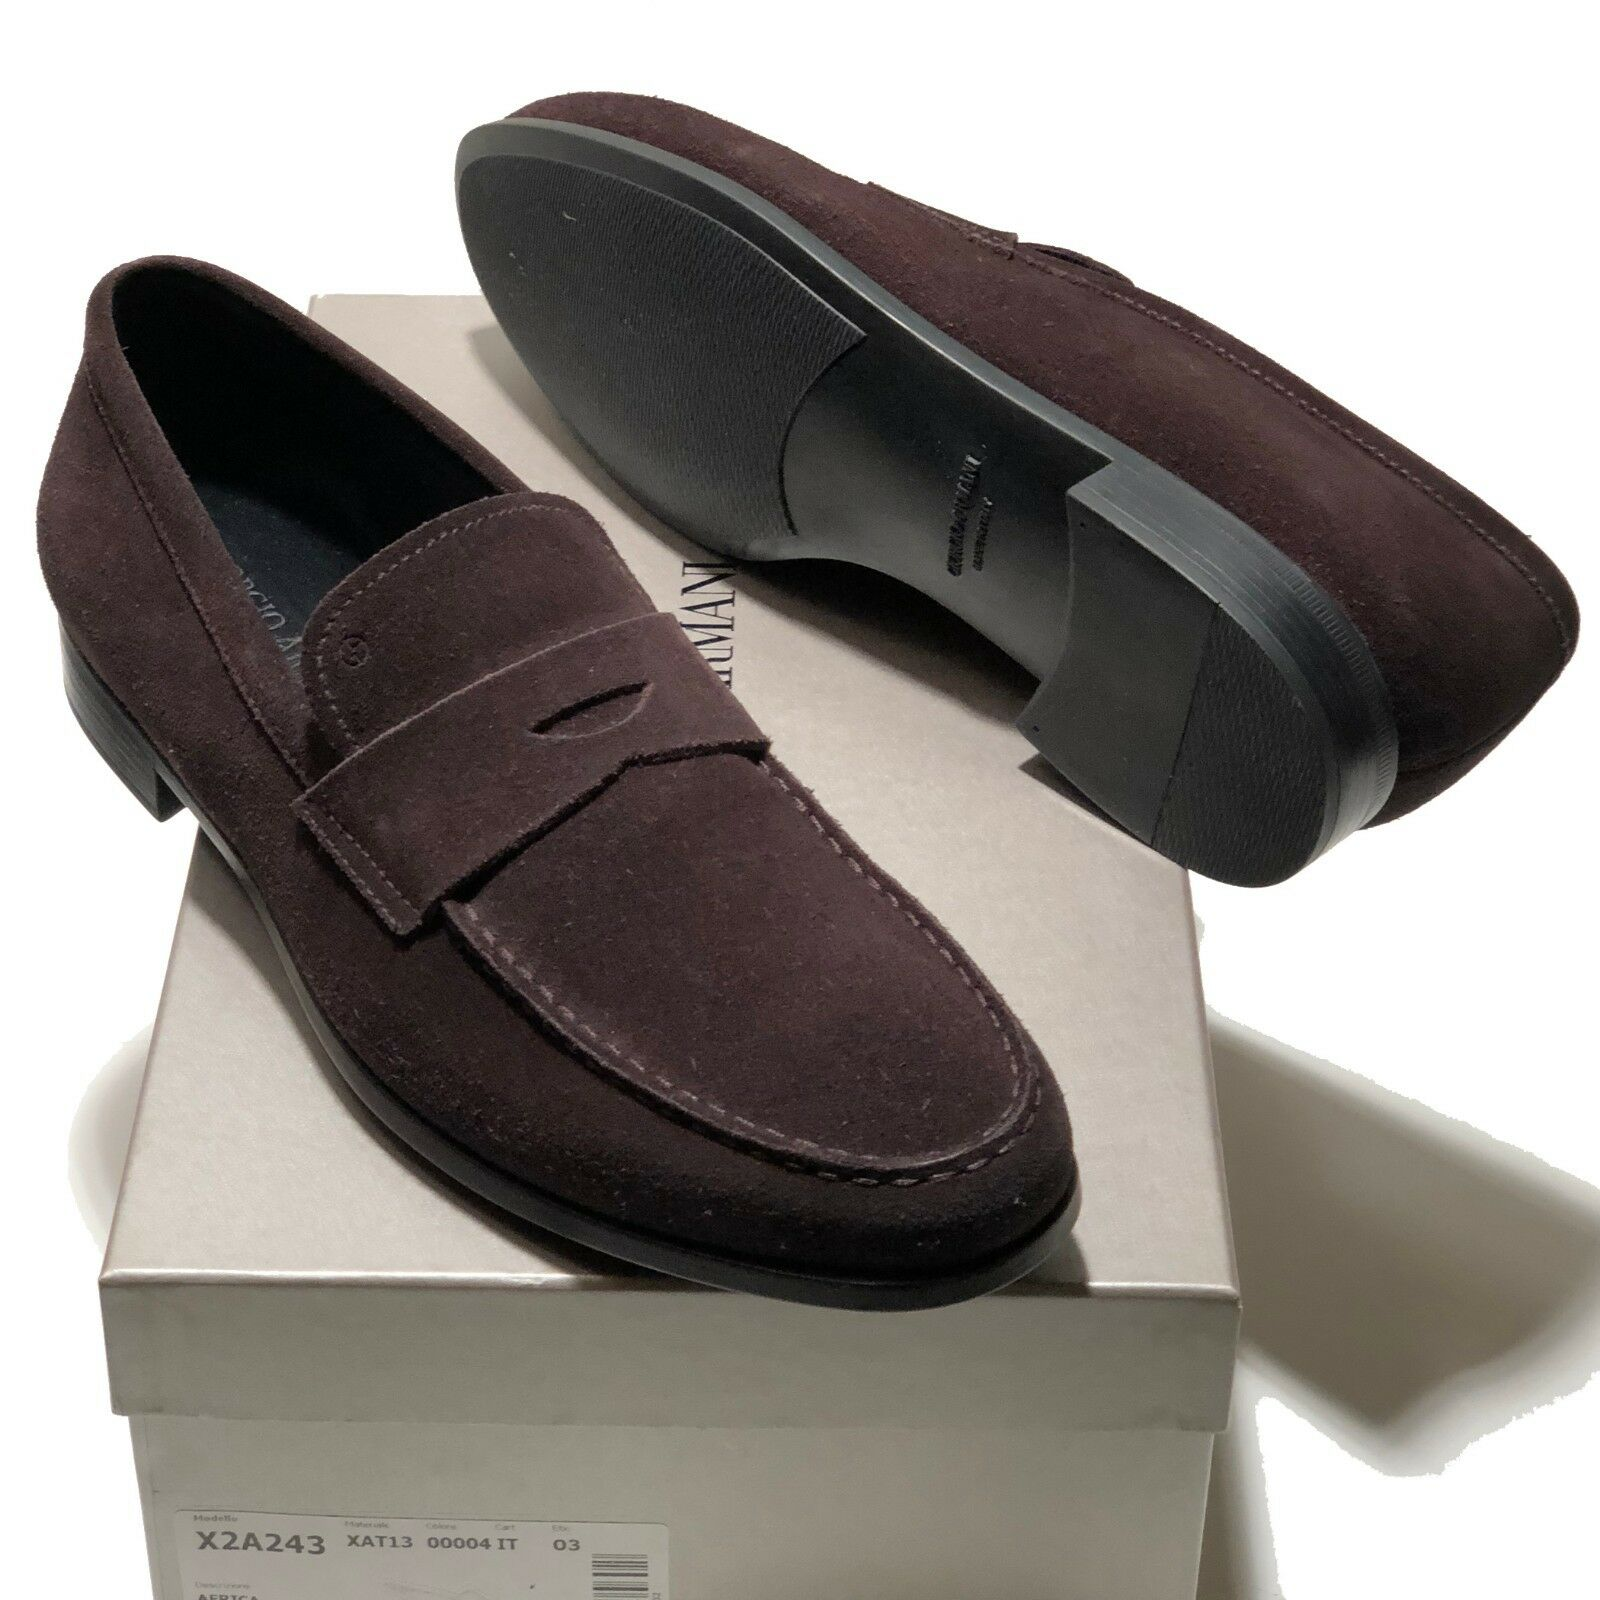 Giorgio Armani ITALY Men's Marroneee Suede Leather Penny Loafers scarpe 13 46 Casual